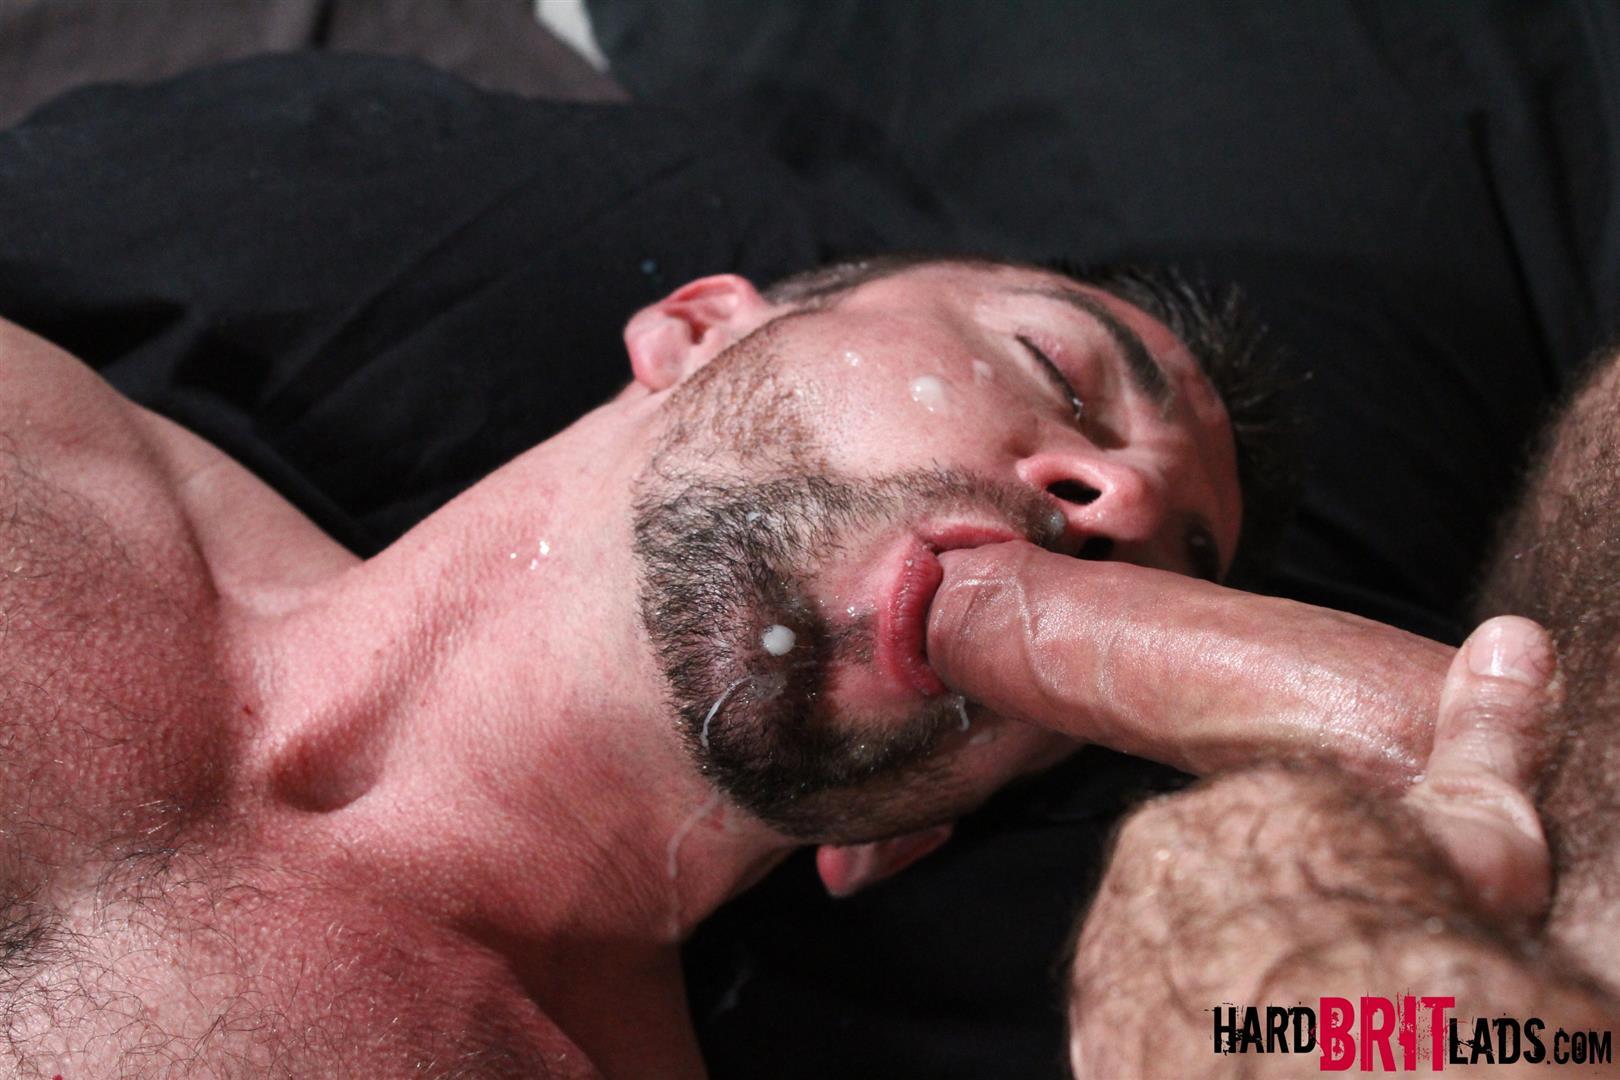 Hard-Brit-Lads-Craig-Daniel-Scott-Hunter-Hairy-Muscle-Hunks-With-Big-Uncut-Cocks-Fucking-Amateur-Gay-Porn-20 Hairy Muscle Hunks Fucking And Eating Cum From Big Uncut Cocks